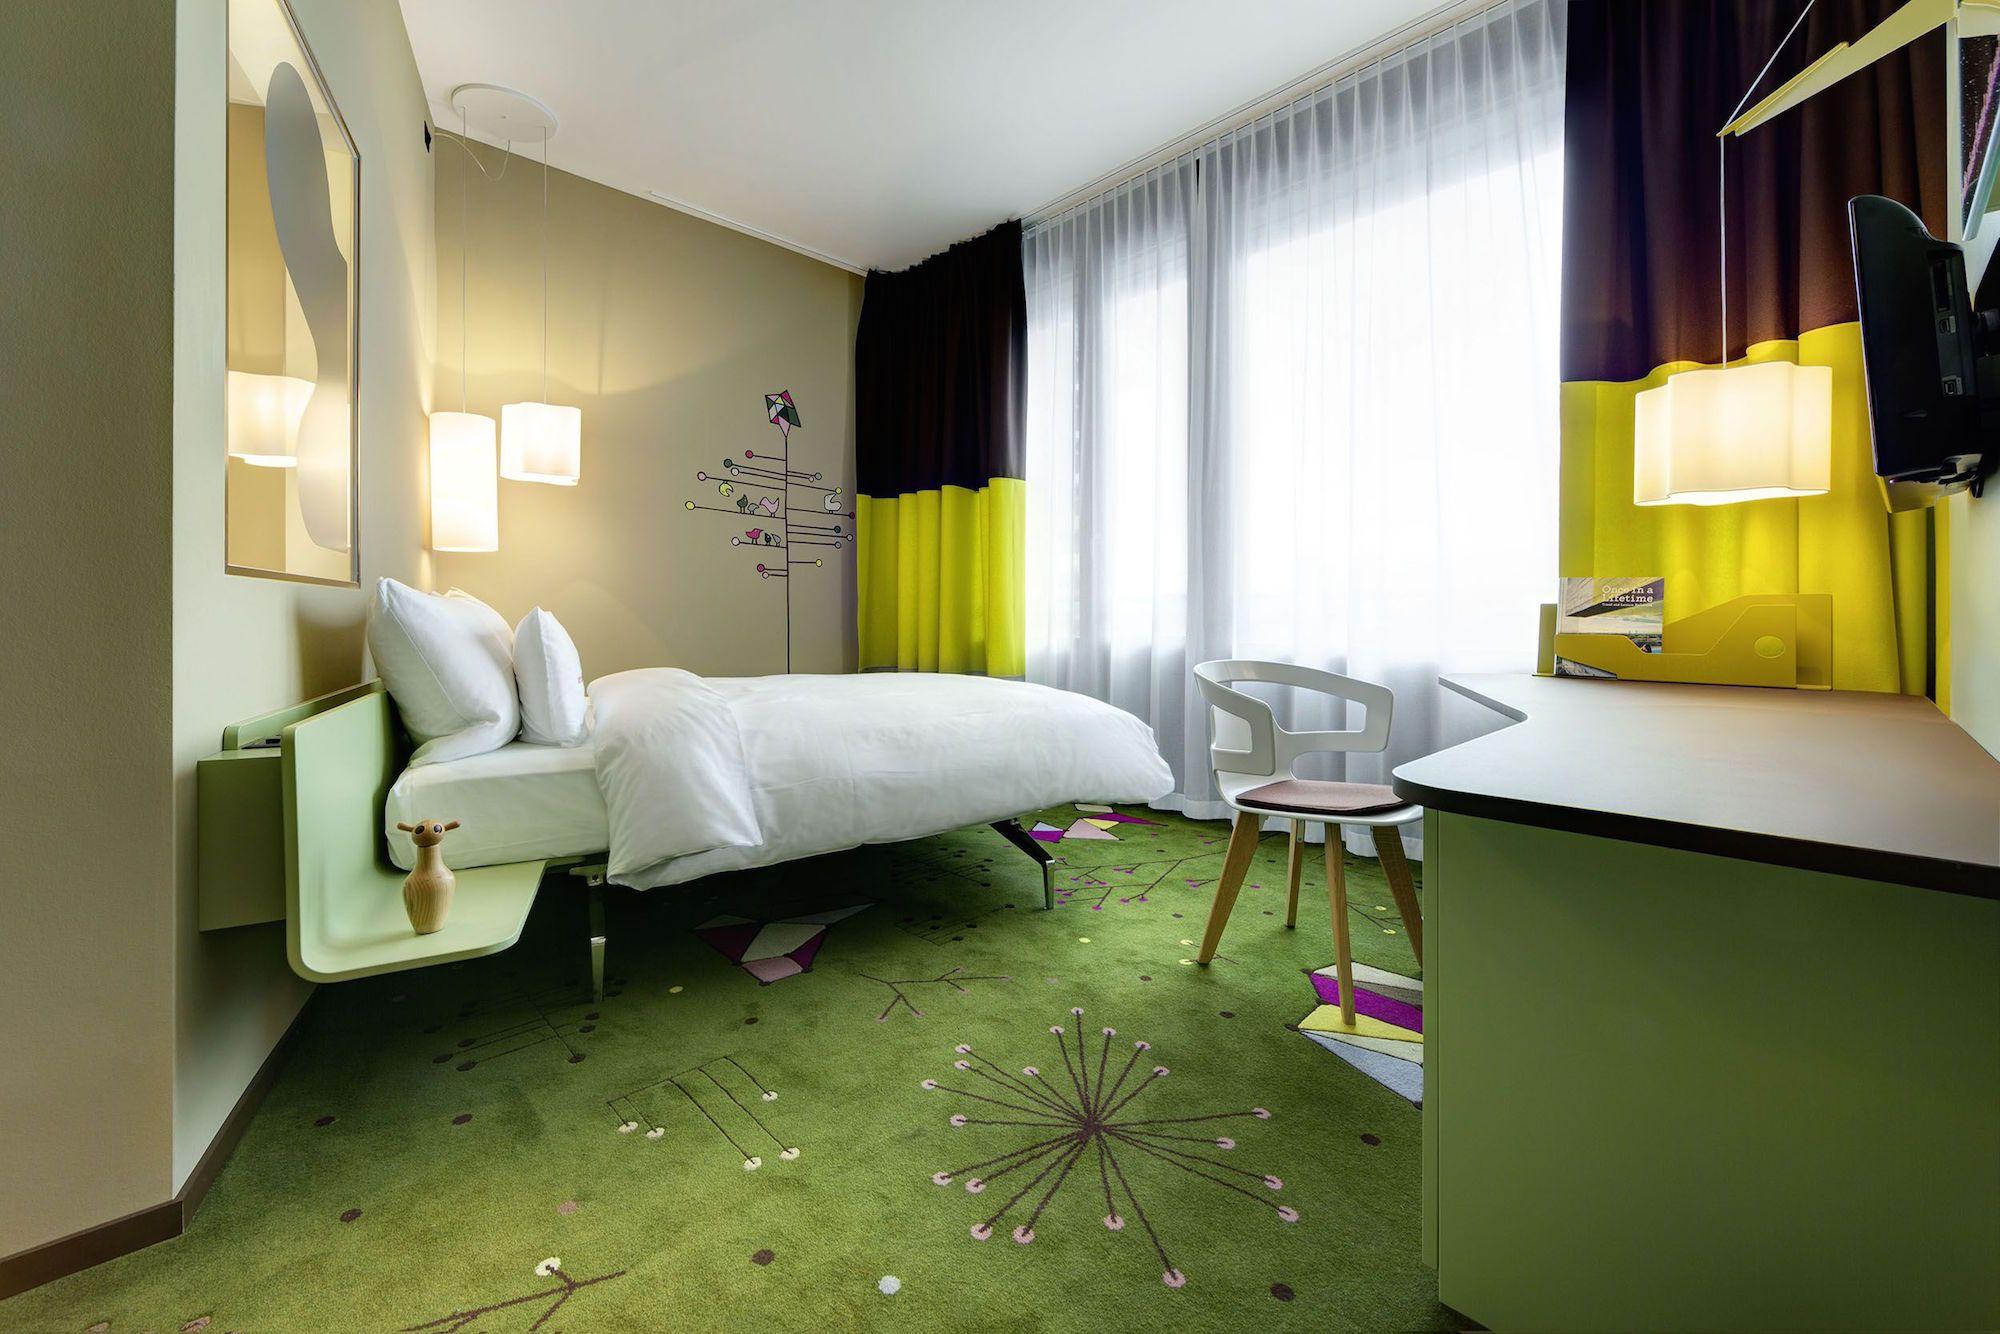 Hotel_25hours_Silberzimmer_01